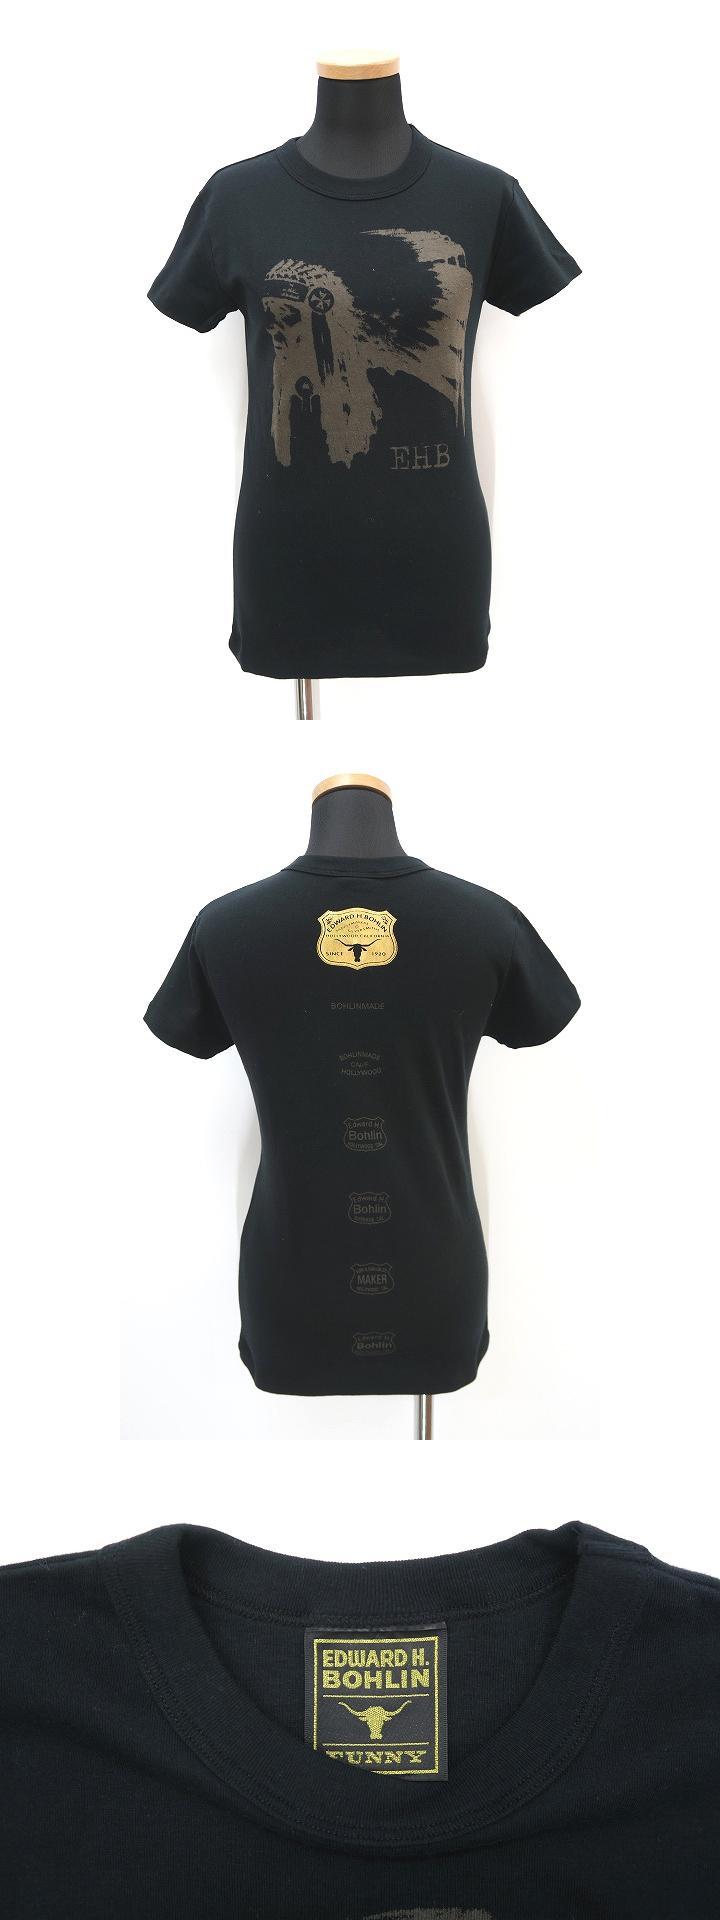 EDWARD H. BOHLIN エドワード エイチ ボーリン プリント 半袖 Tシャツ カットソー M